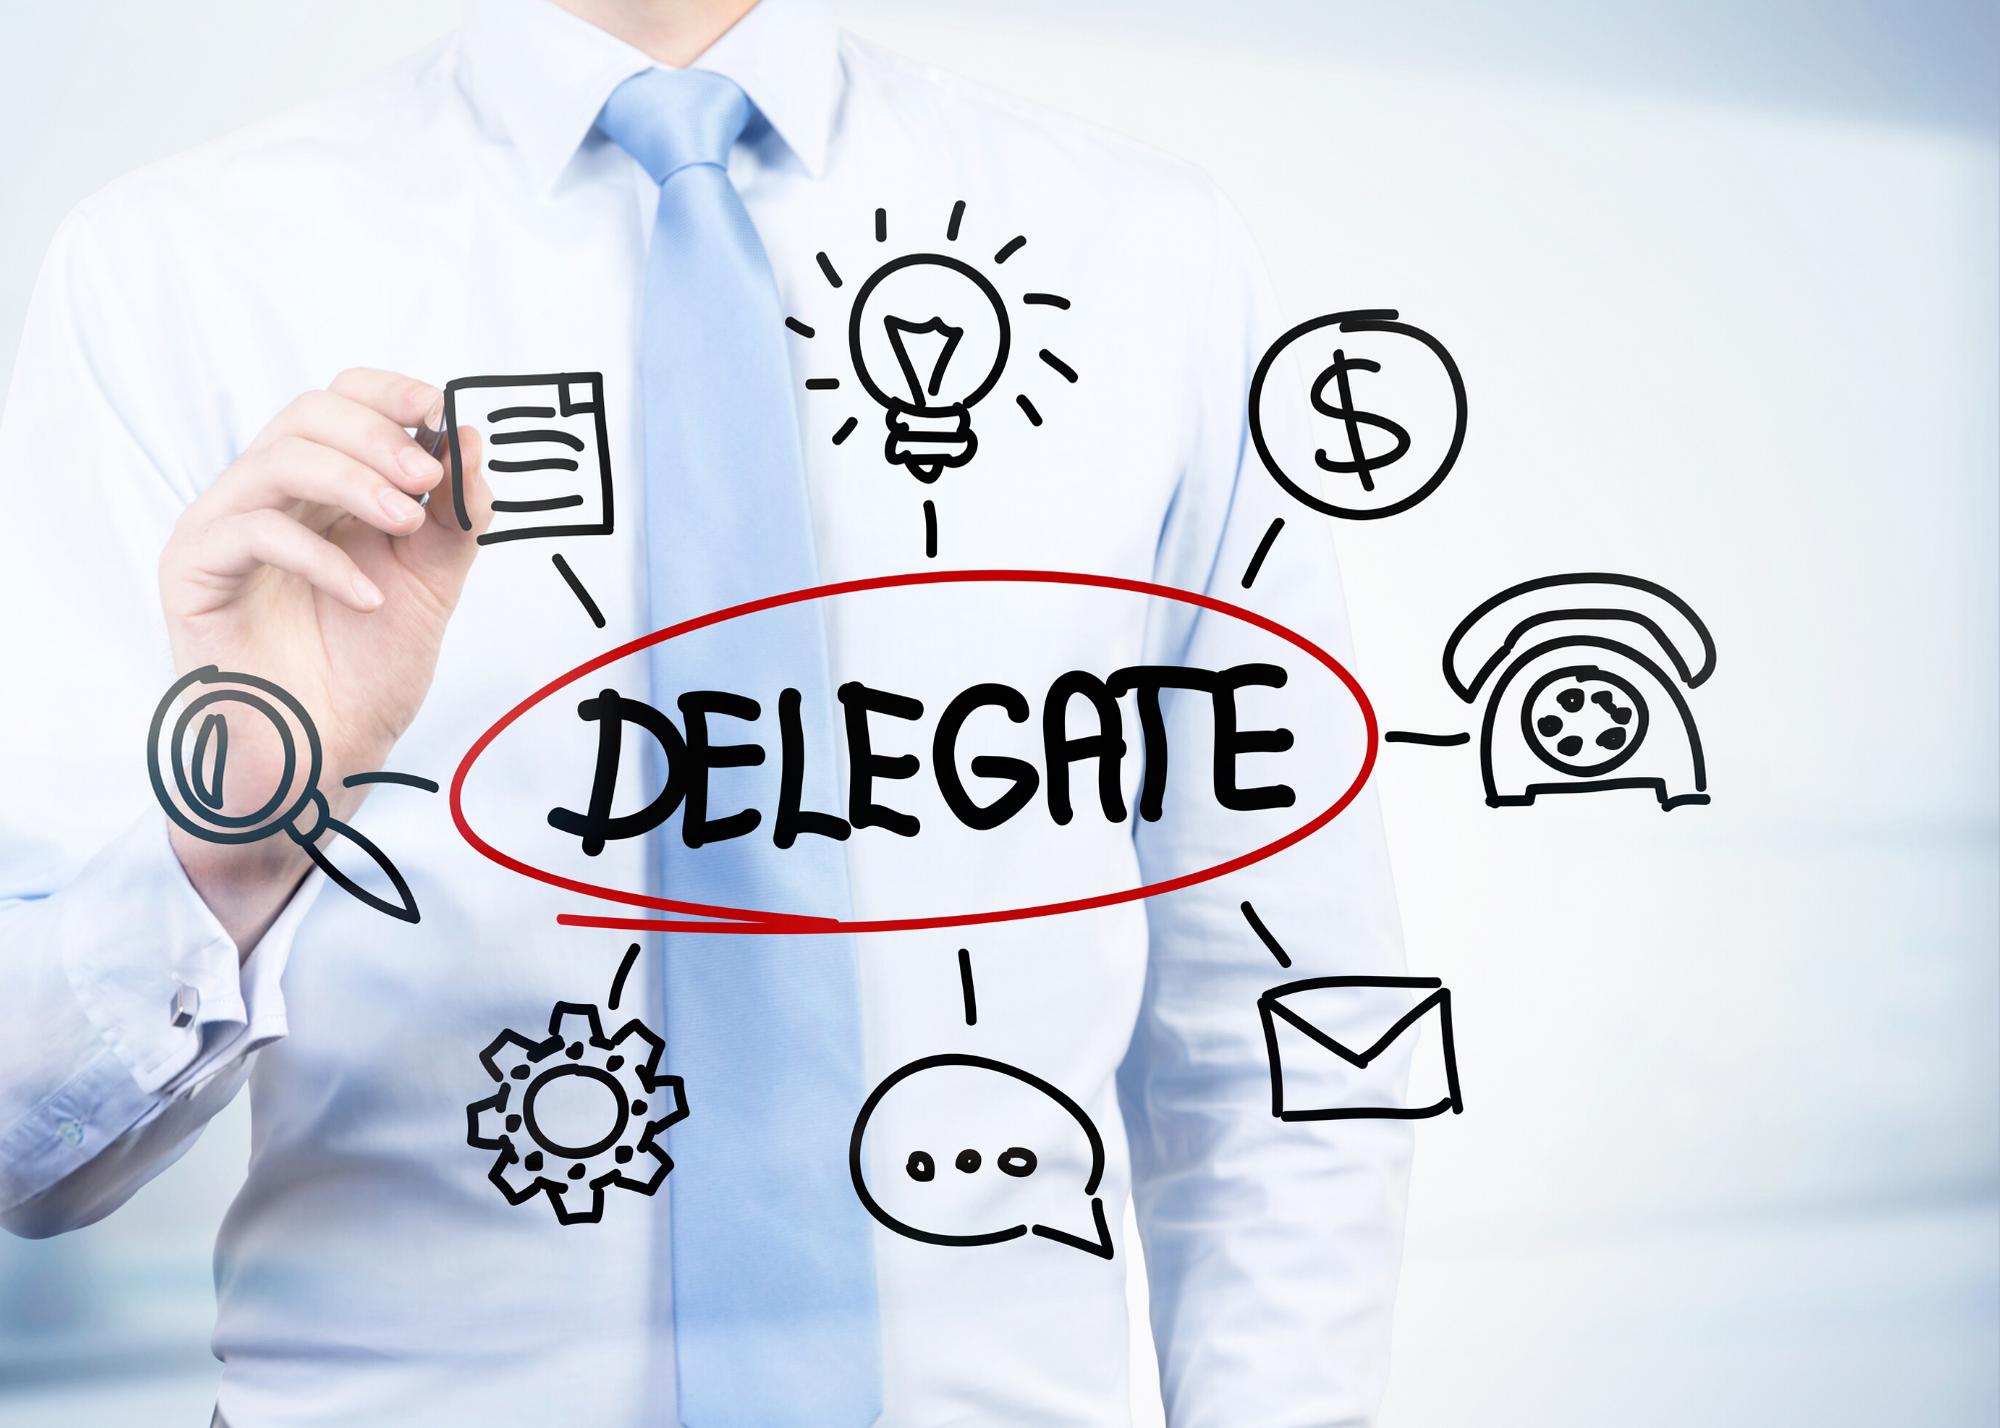 Delegate - task examples